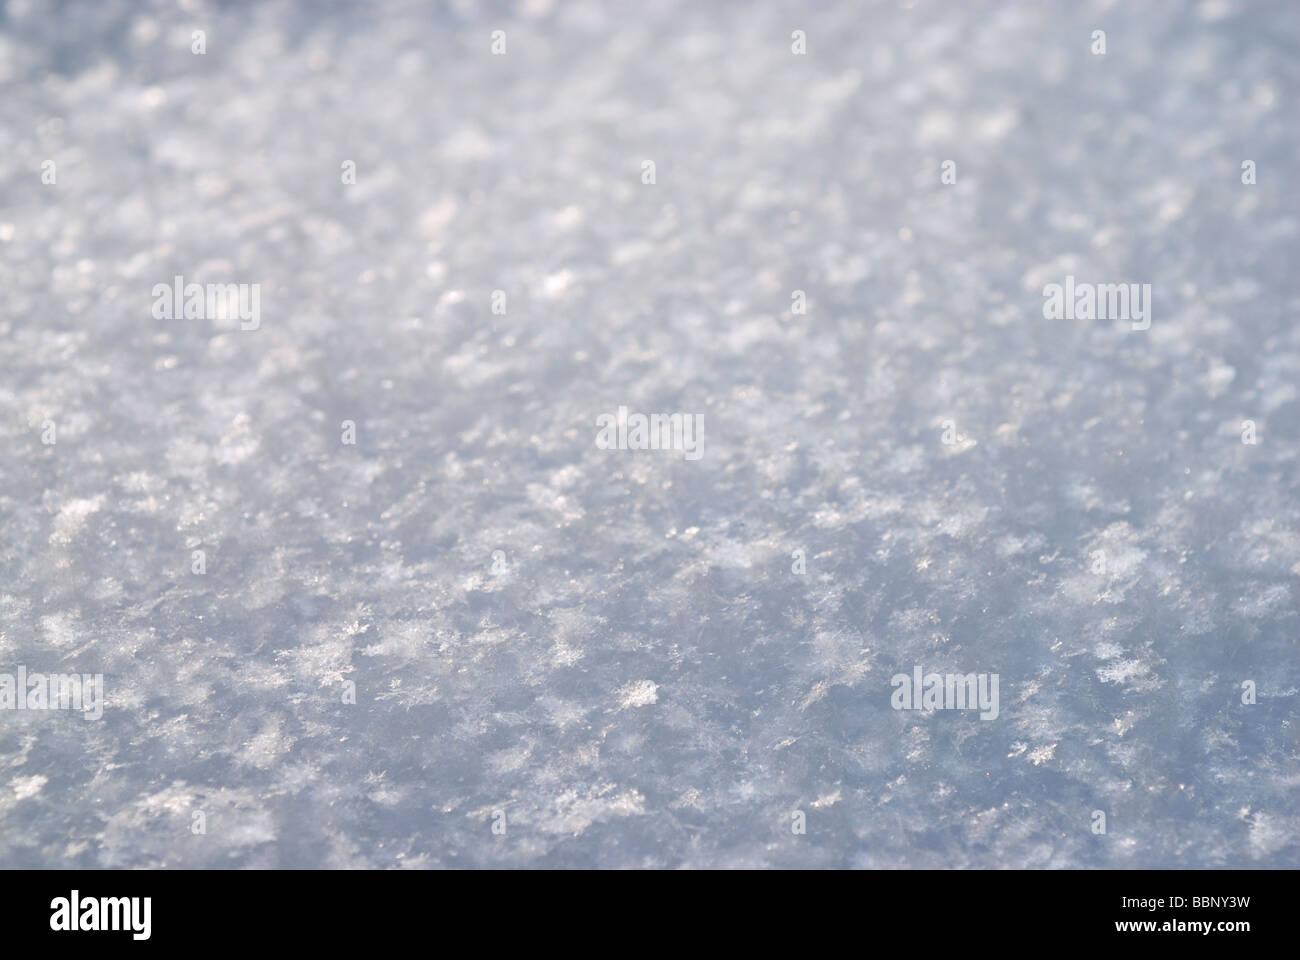 Snow background - Stock Image